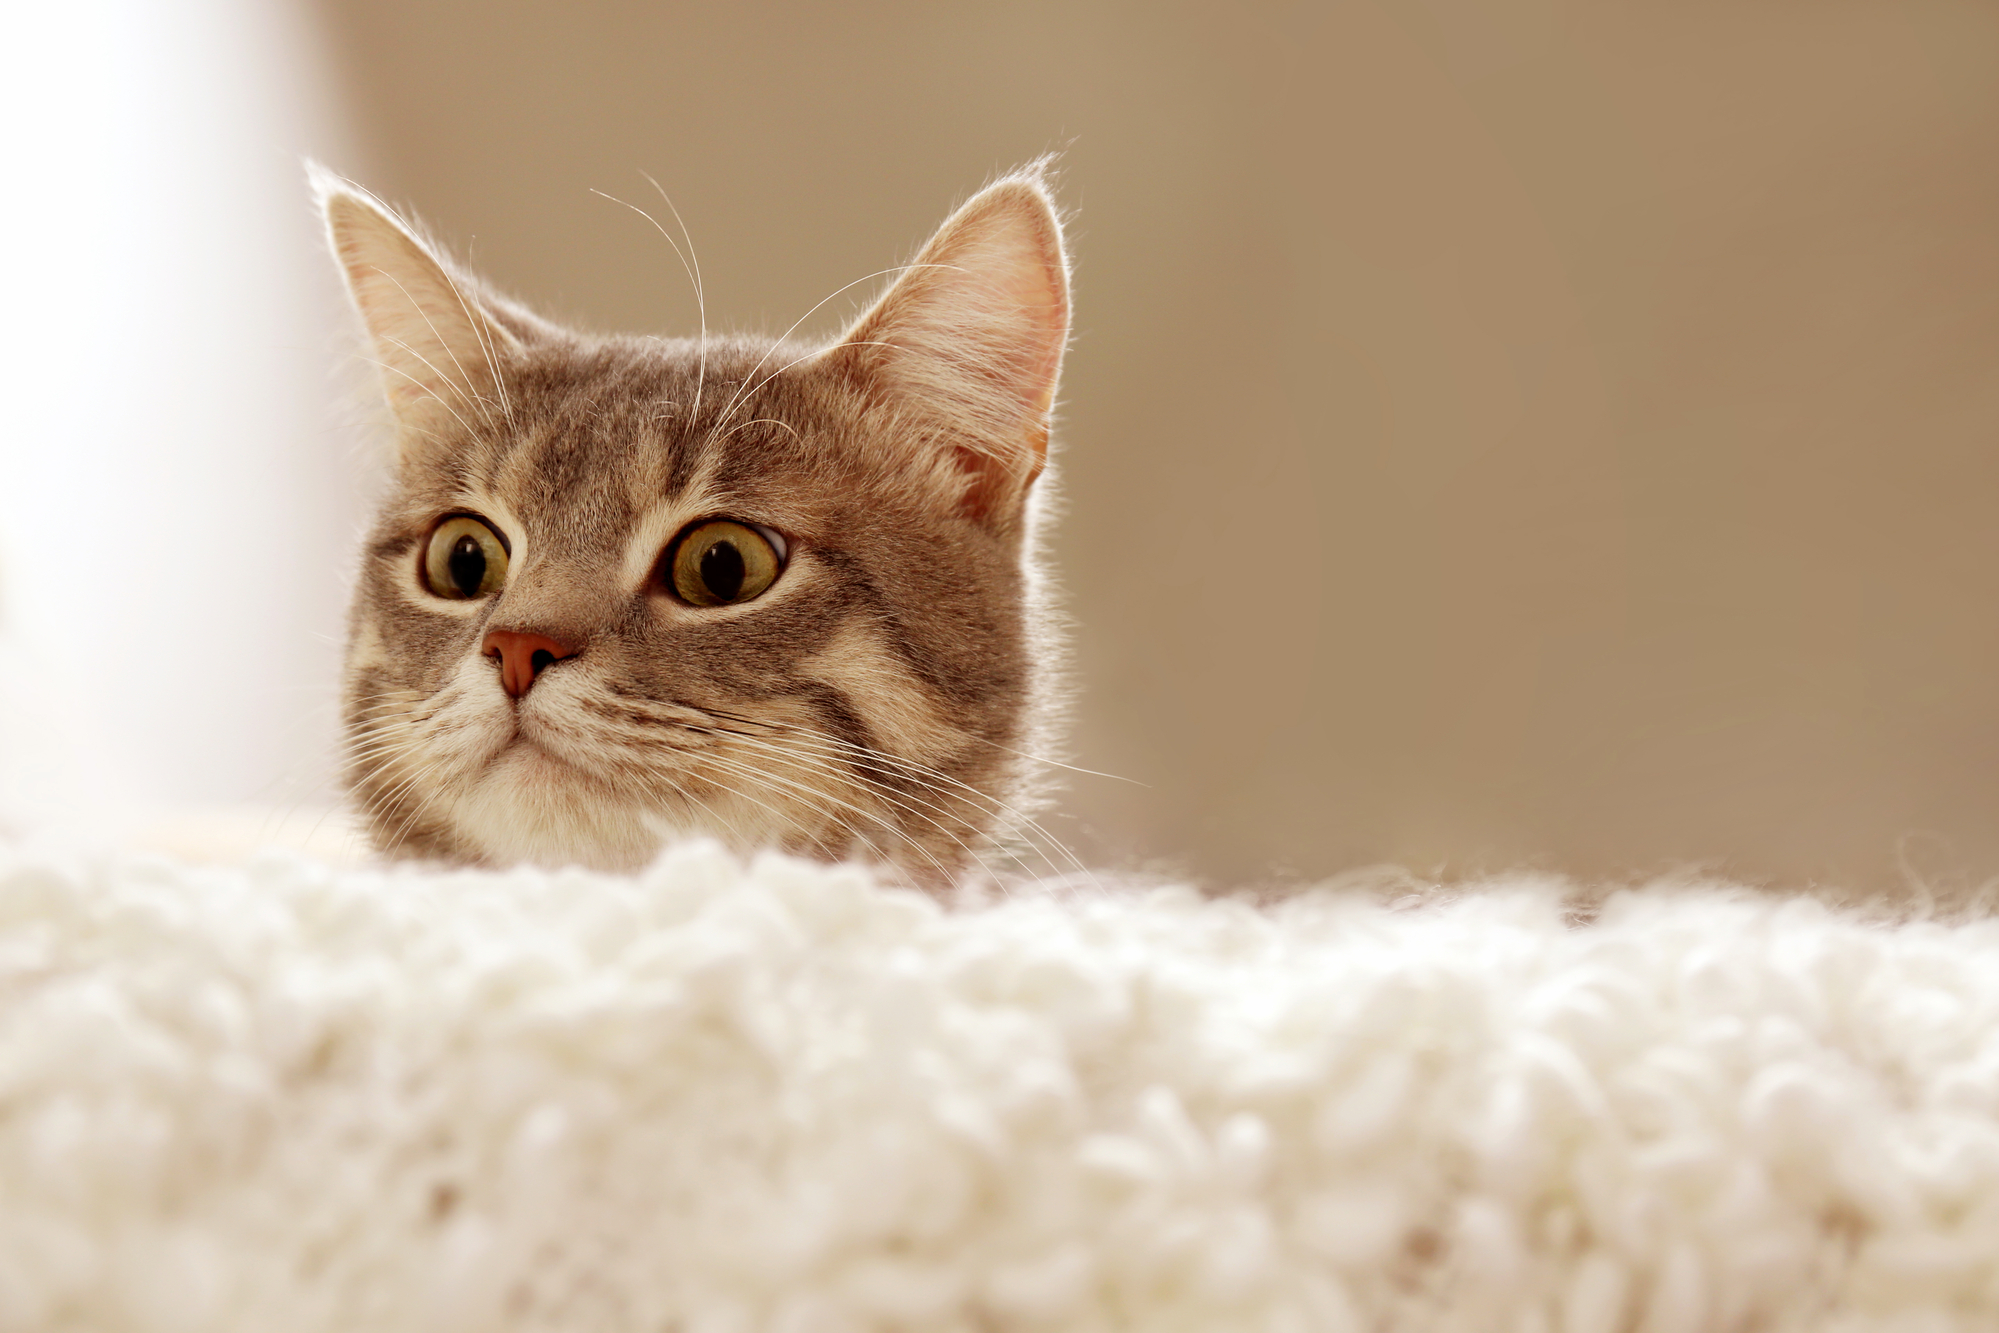 Comprehensive case studies have confirmed human-to-cat transmission of SARS-CoV-2